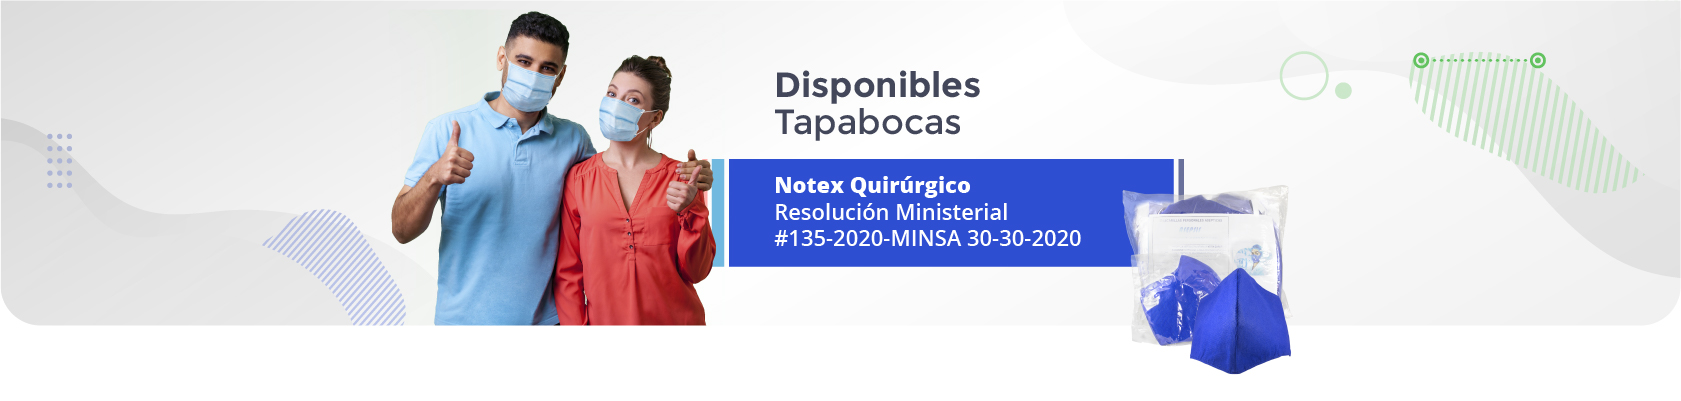 tapabocas-100